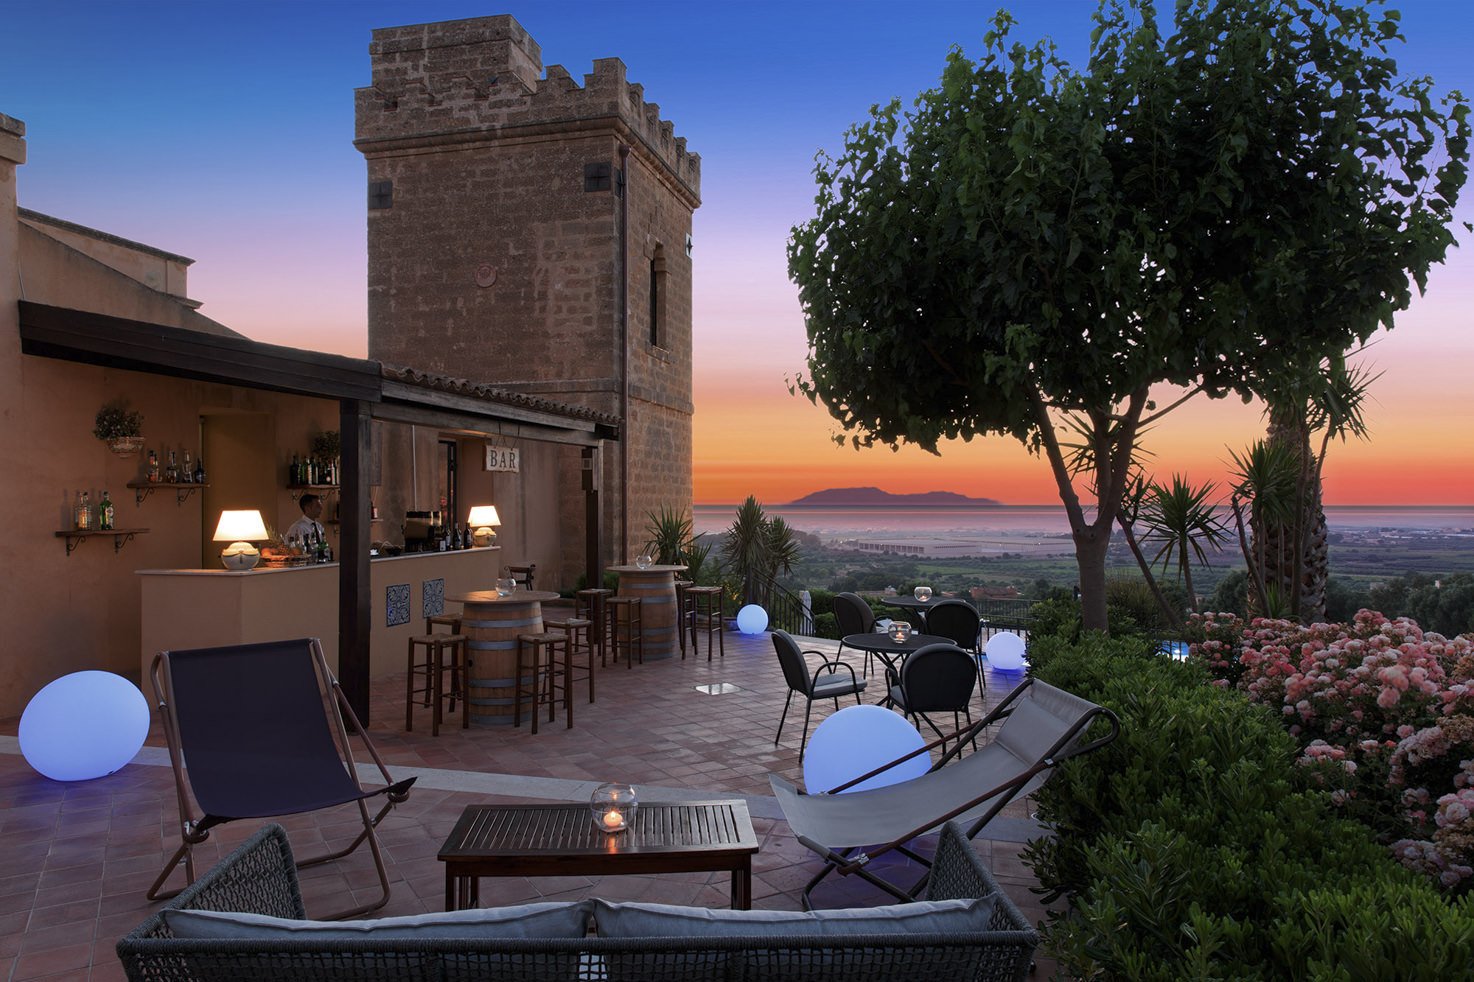 Aperitif on the terrace